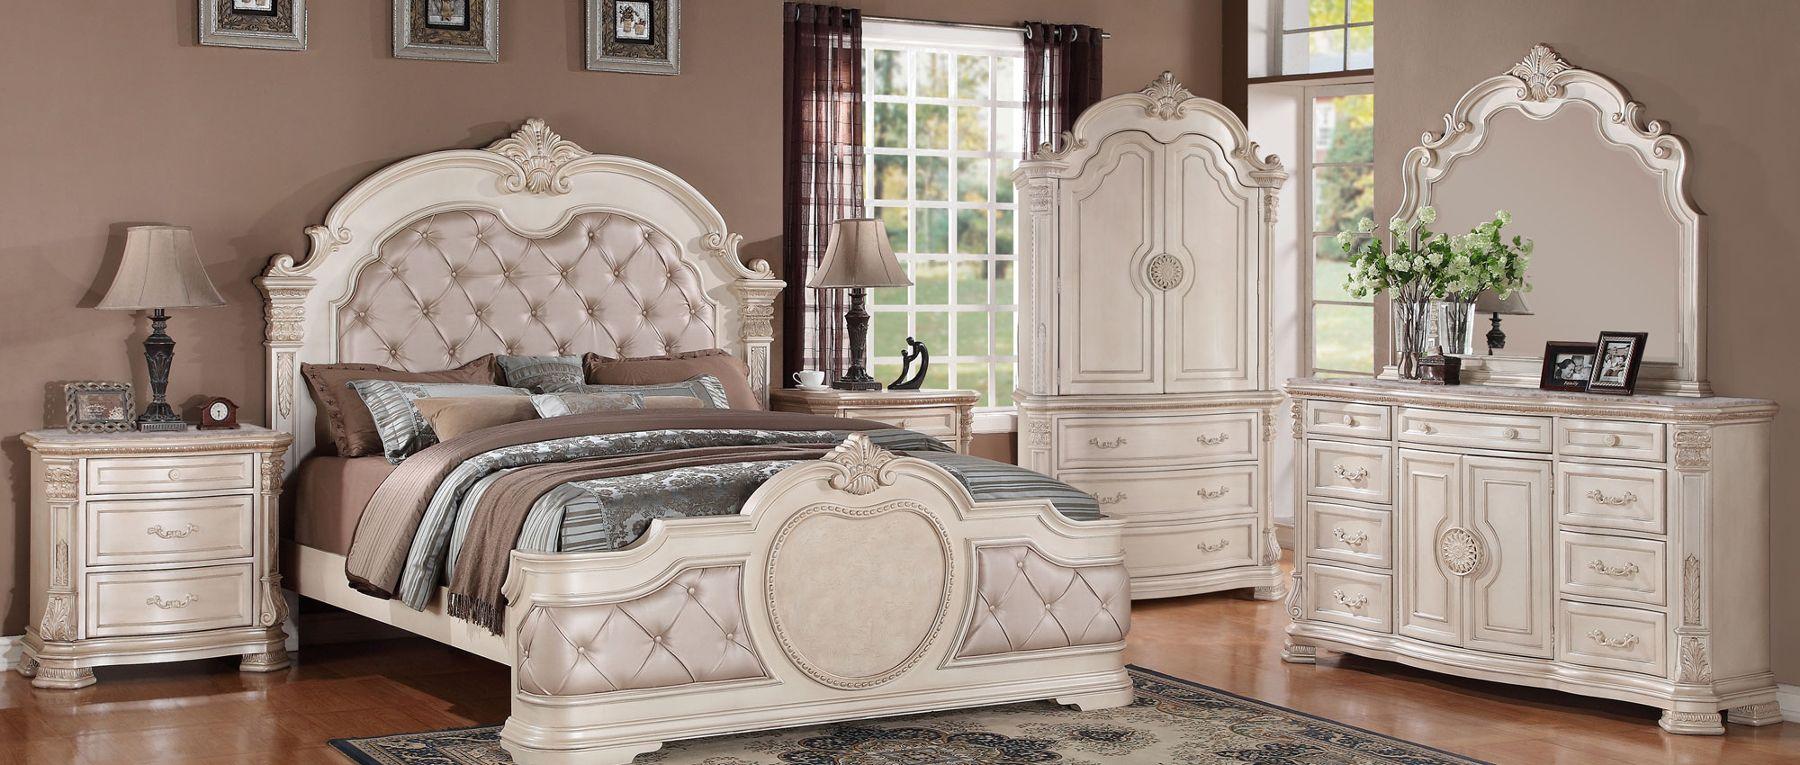 Marble Bedroom Furniture Sets Marble Top Bedroom Furniture Furniture Bedroom Well Liked White